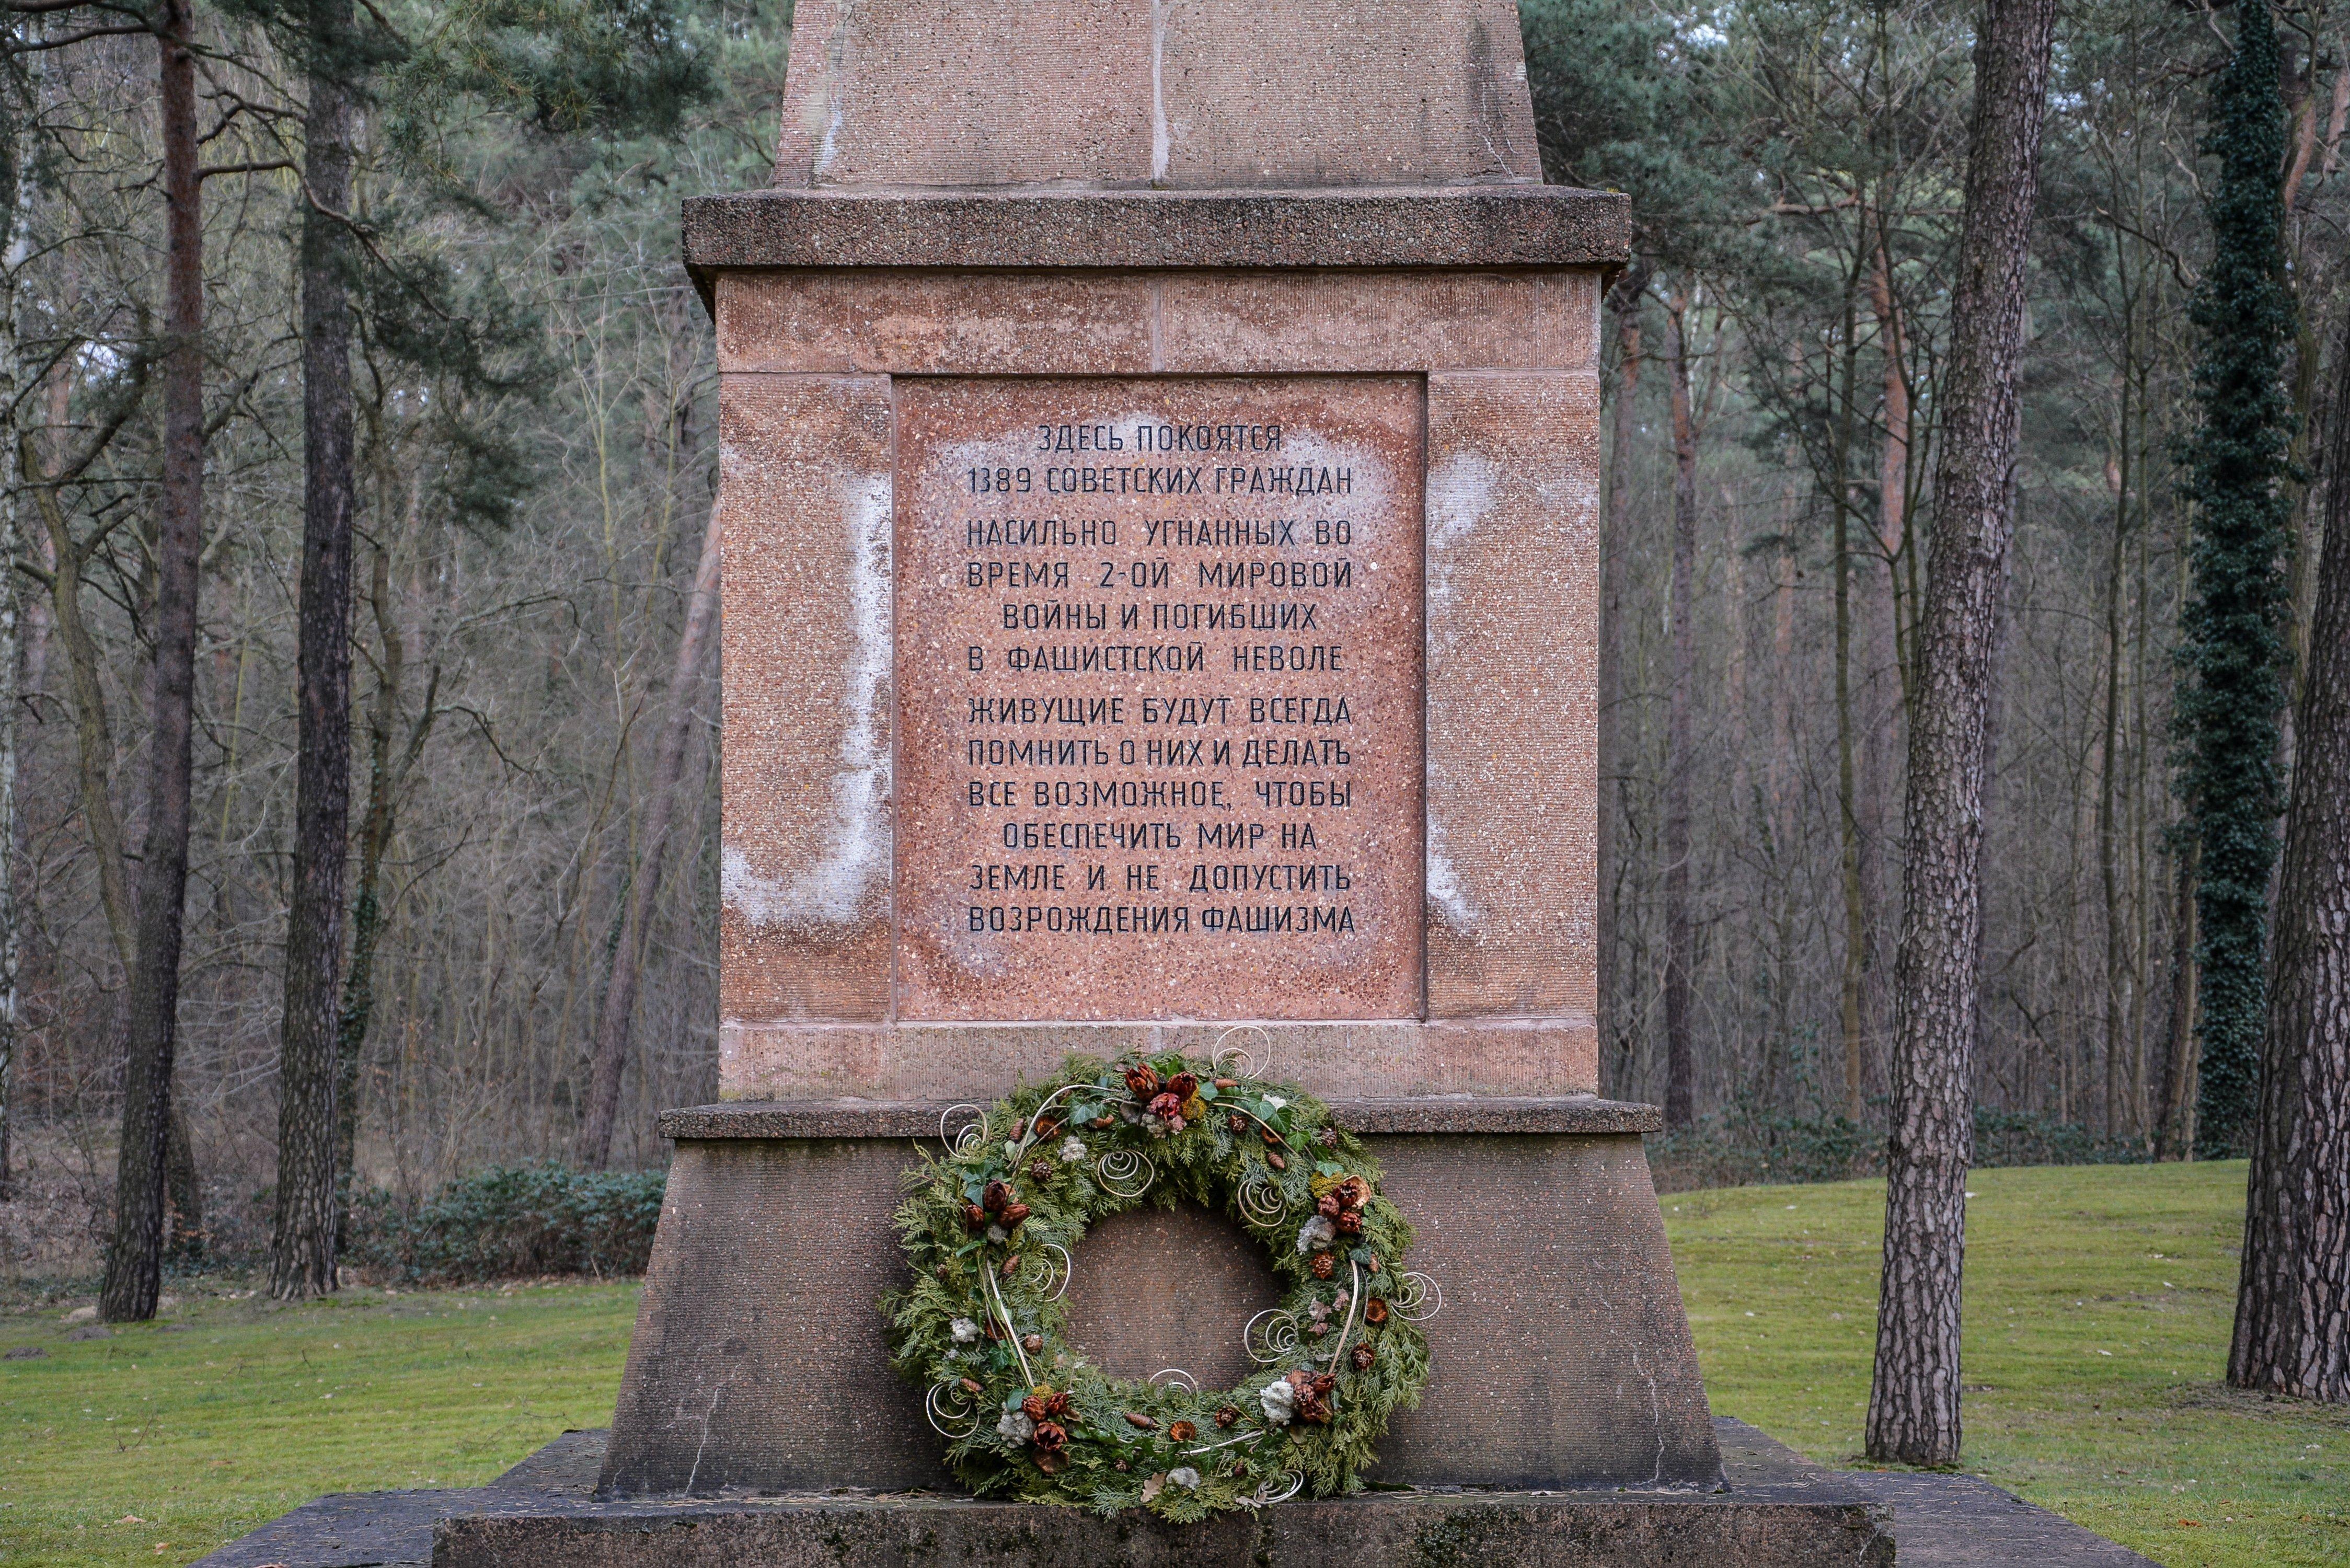 inscription dedication sowjetisches ehrenmal gueterfelde soviet war memorial gueterfelde front obelisk russian monument war graves brandenburg berlin germany